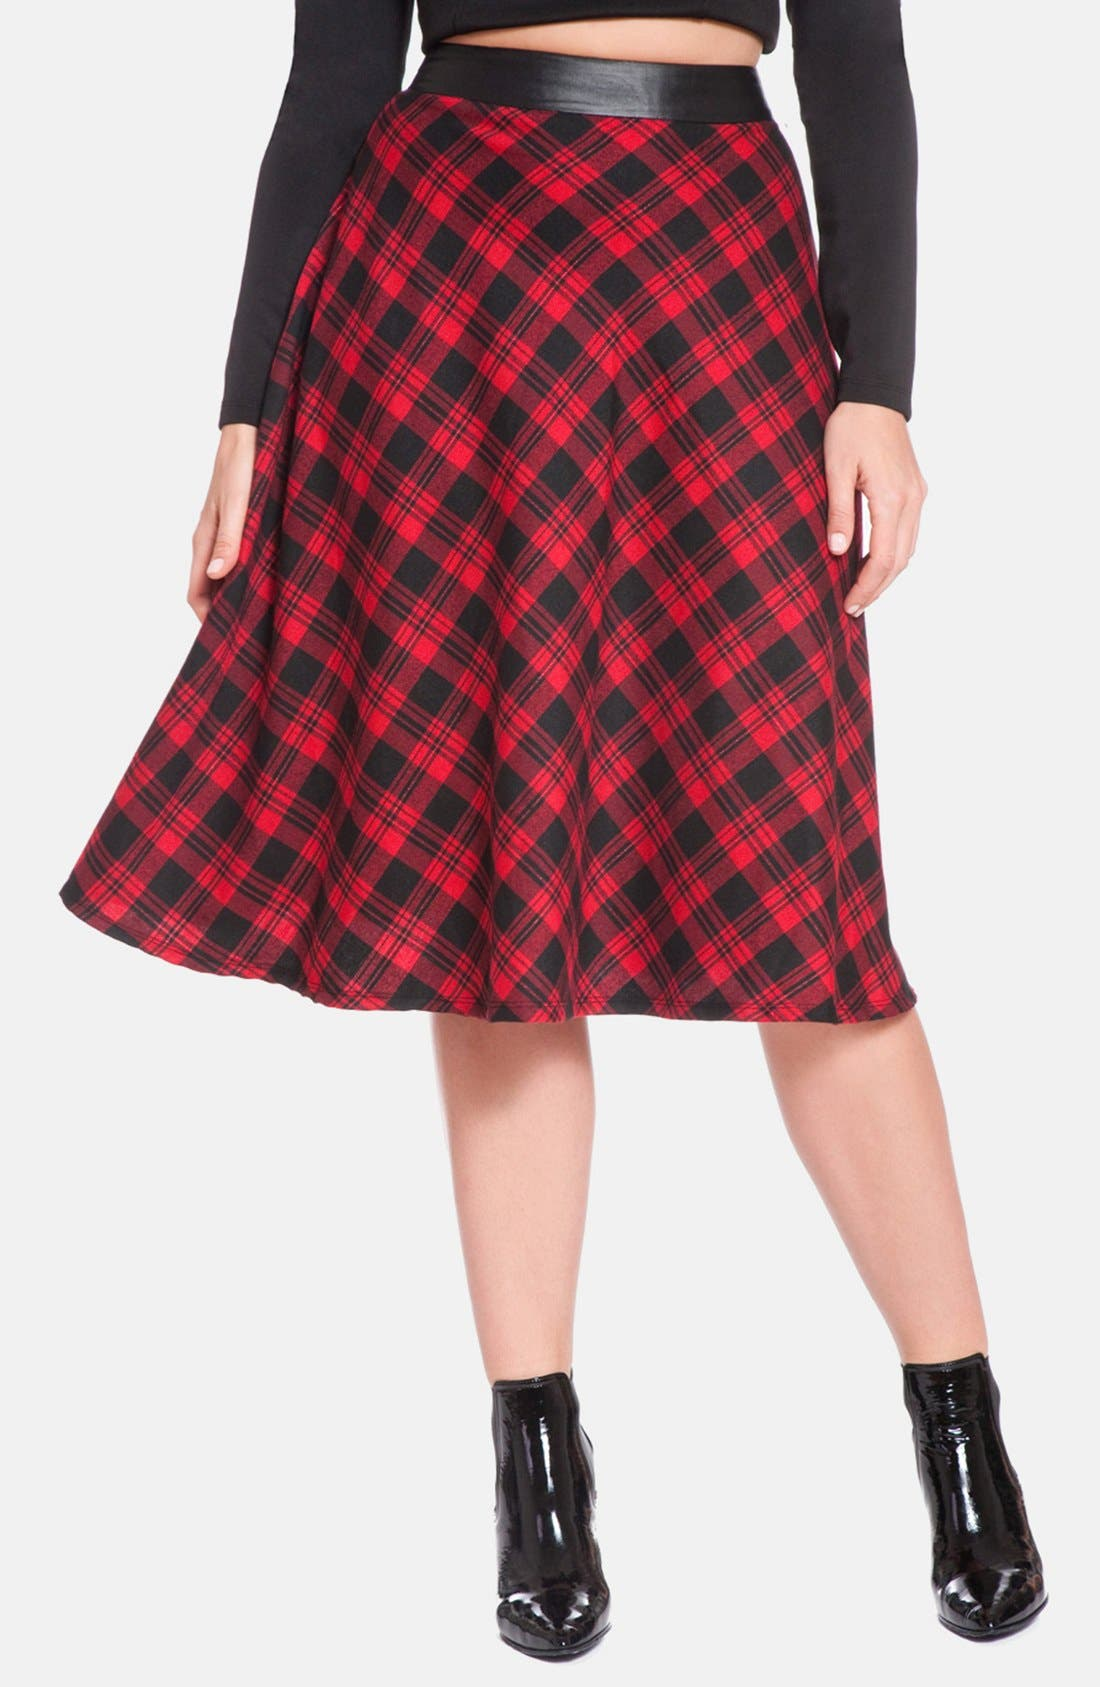 Alternate Image 1 Selected - ELOQUII Tartan Plaid Midi Skirt (Plus Size)